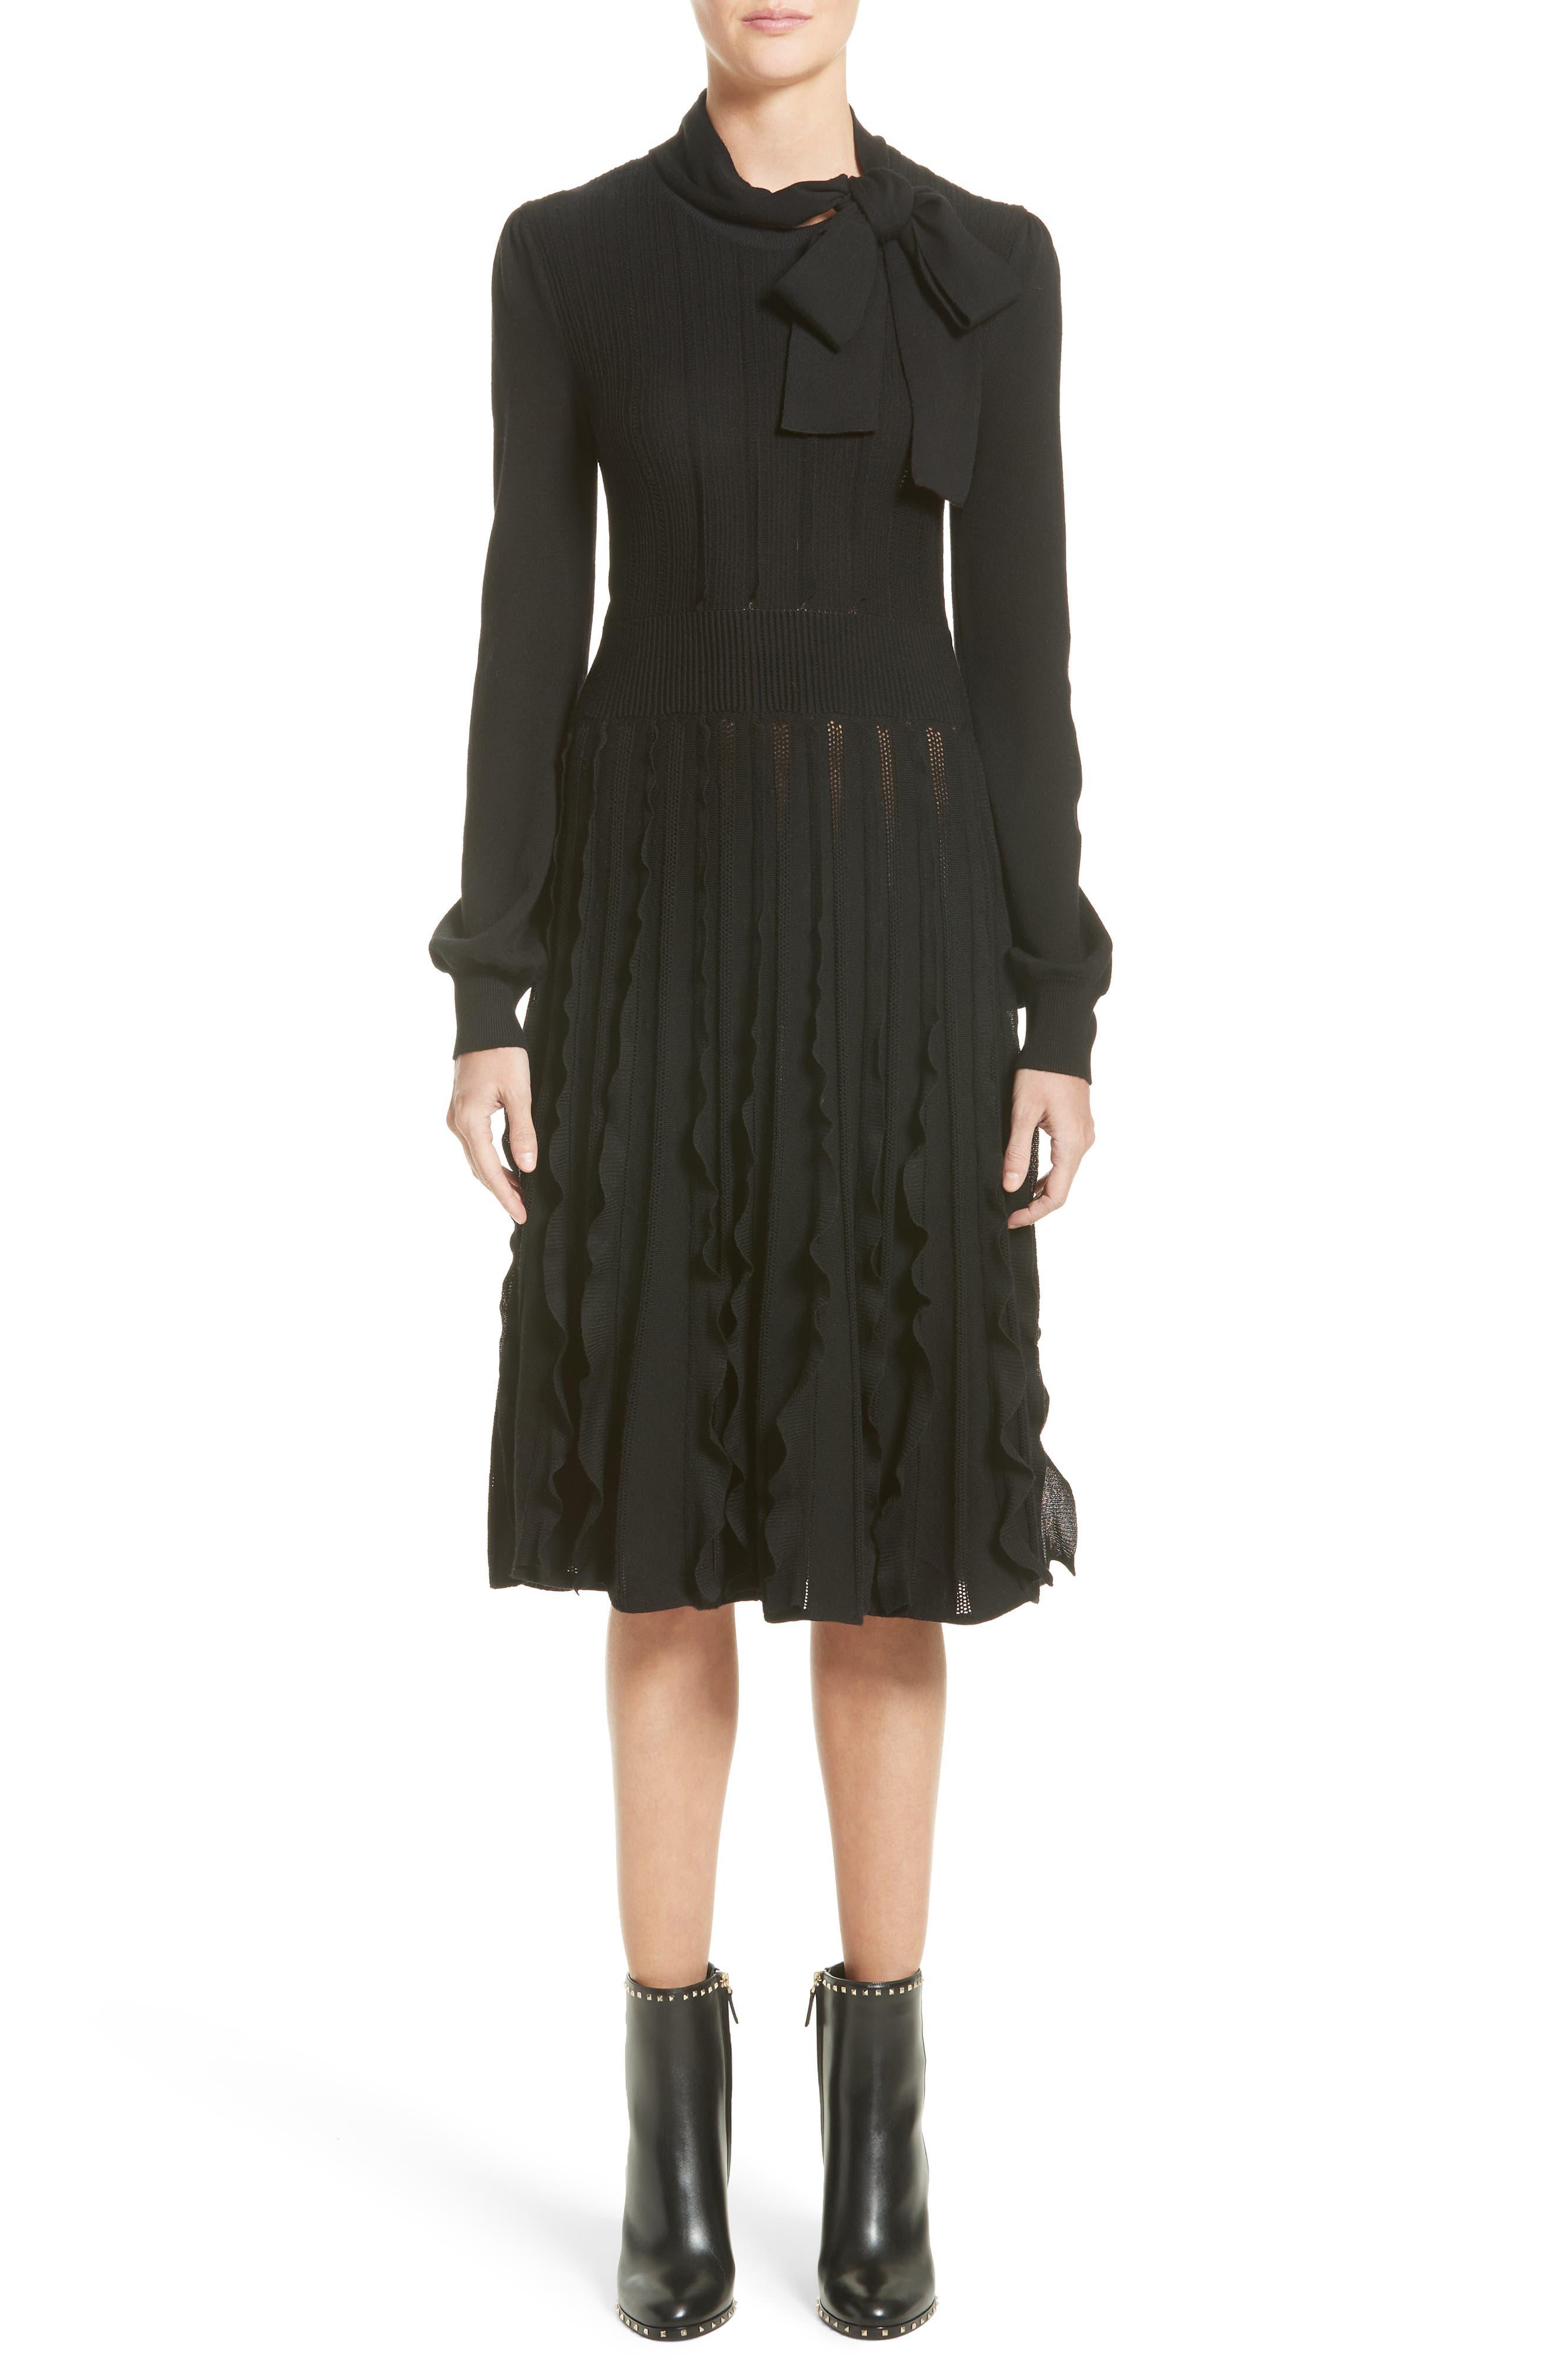 Ruffle Skirt Wool Knit Dress,                             Main thumbnail 1, color,                             Black